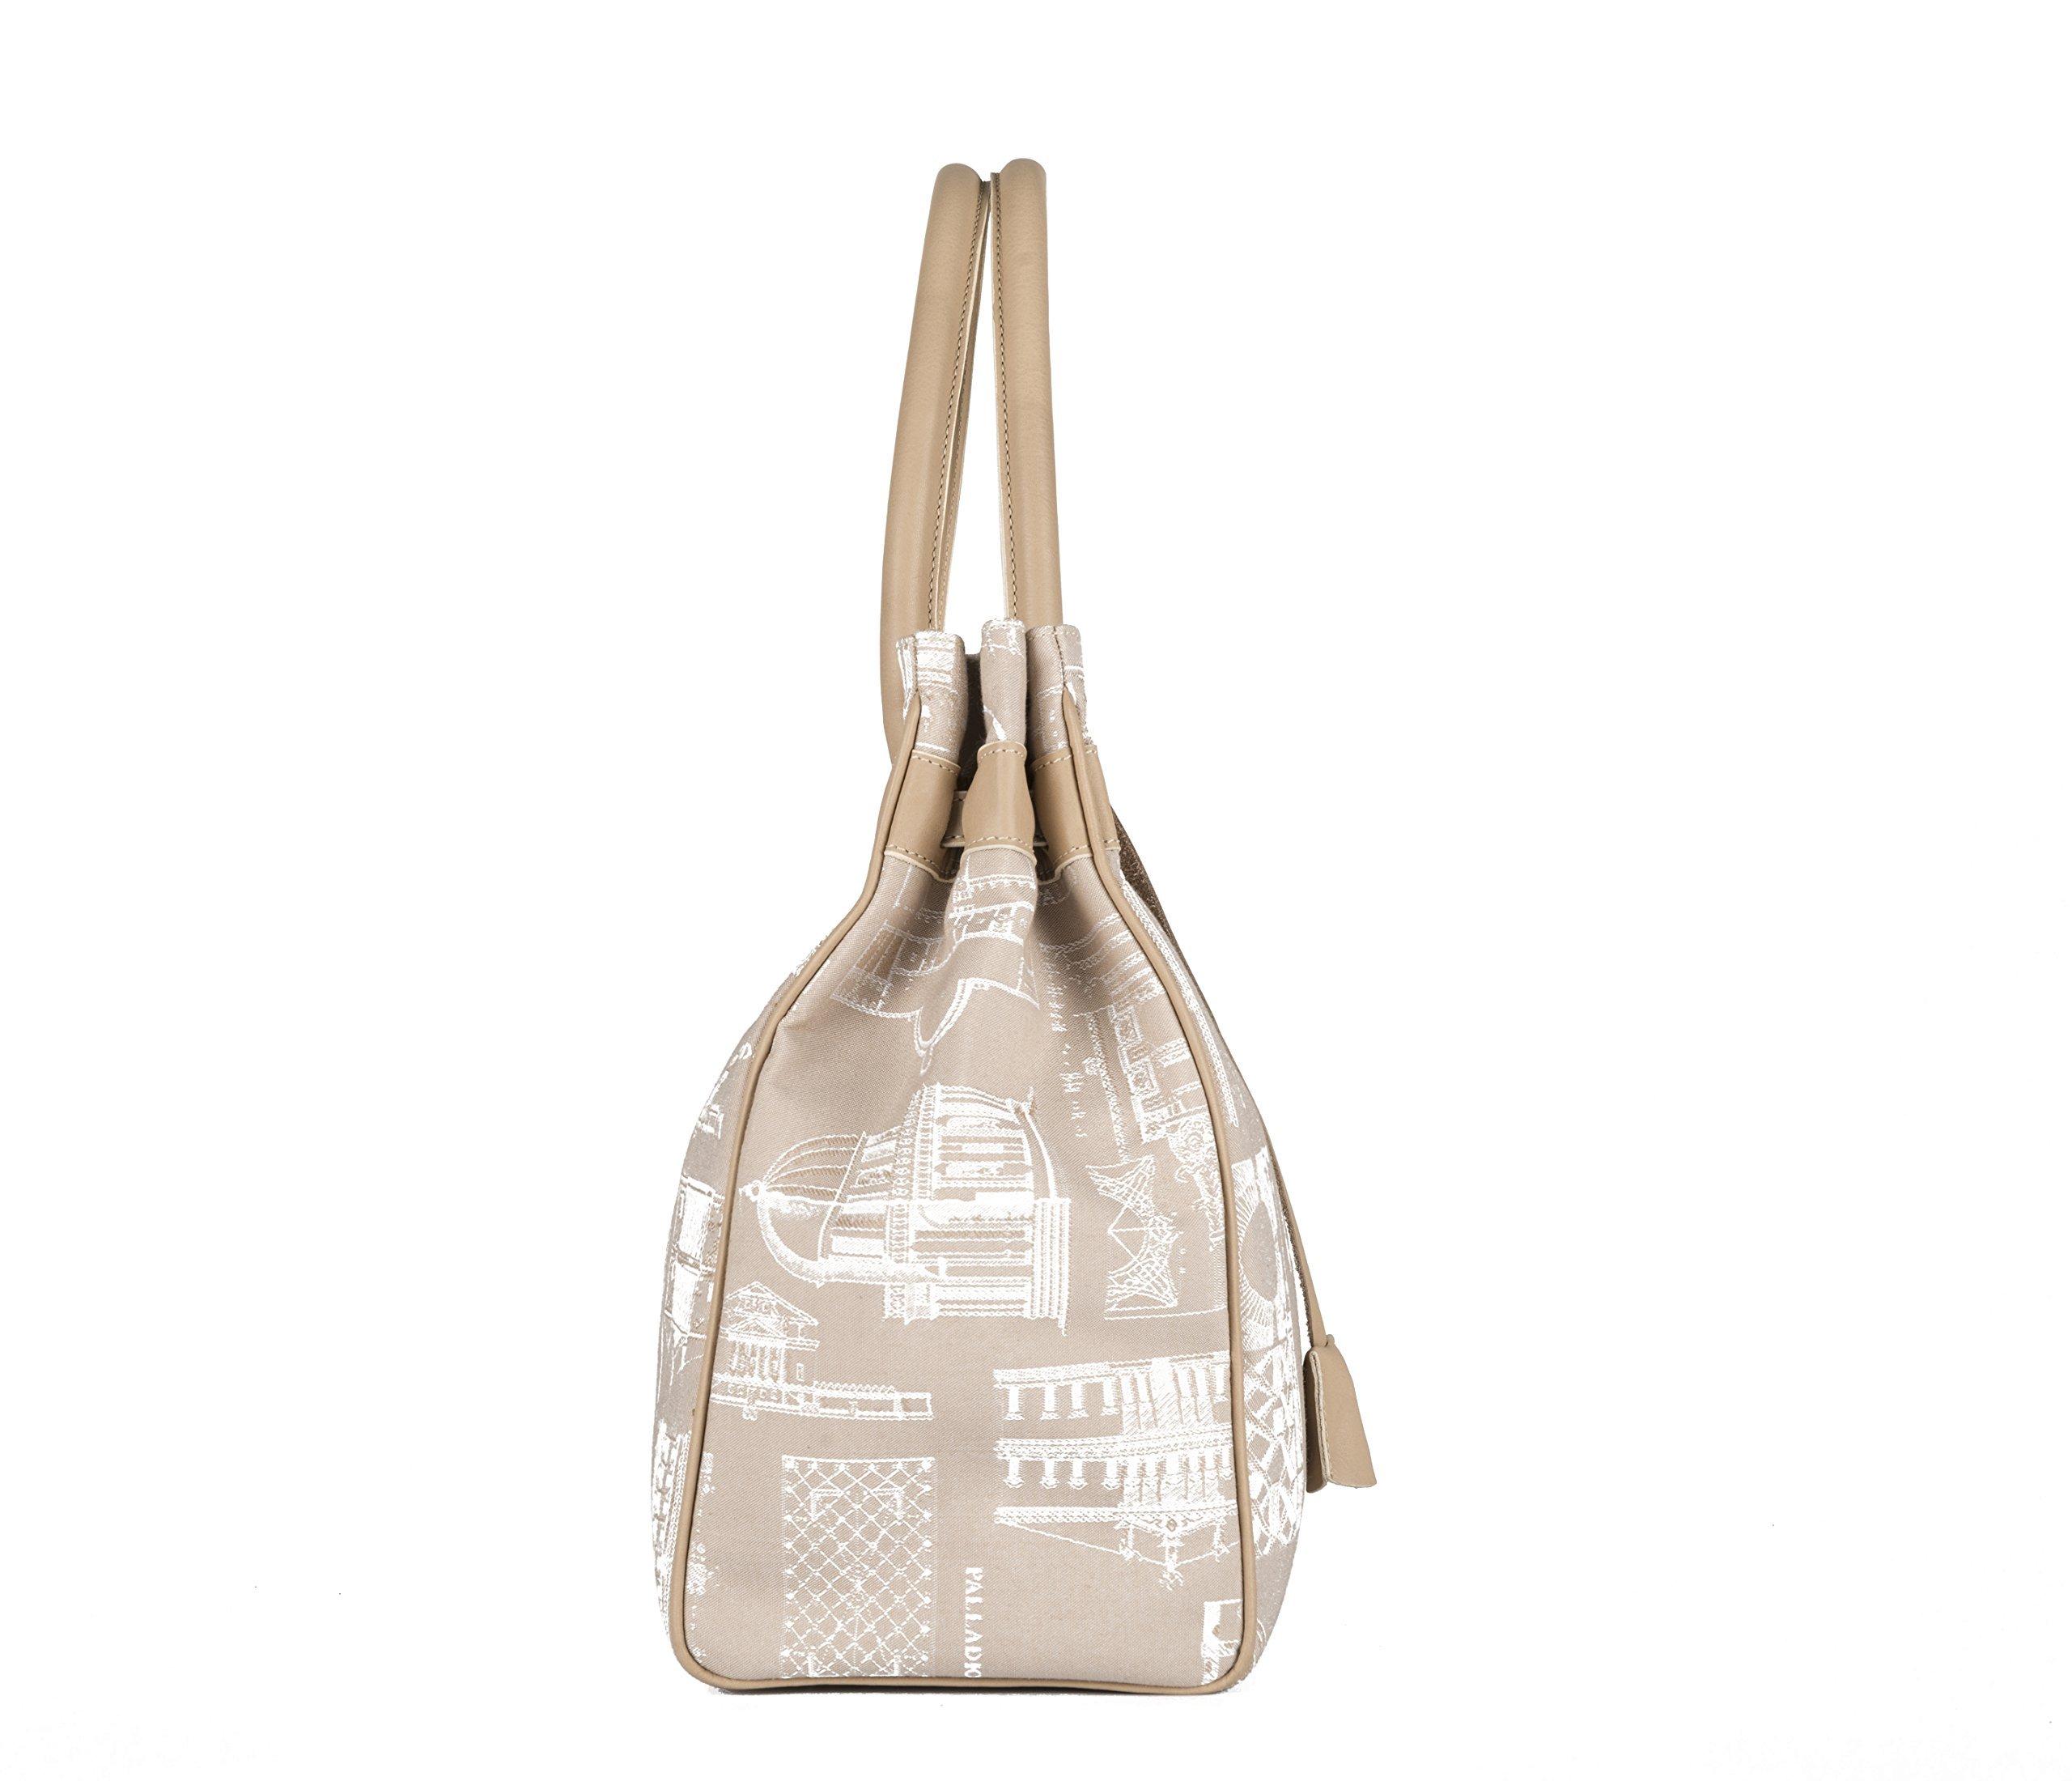 Palladiobags, Villa Angarano bag (Birkin), Made in Italy, squirrel - handmade-bags